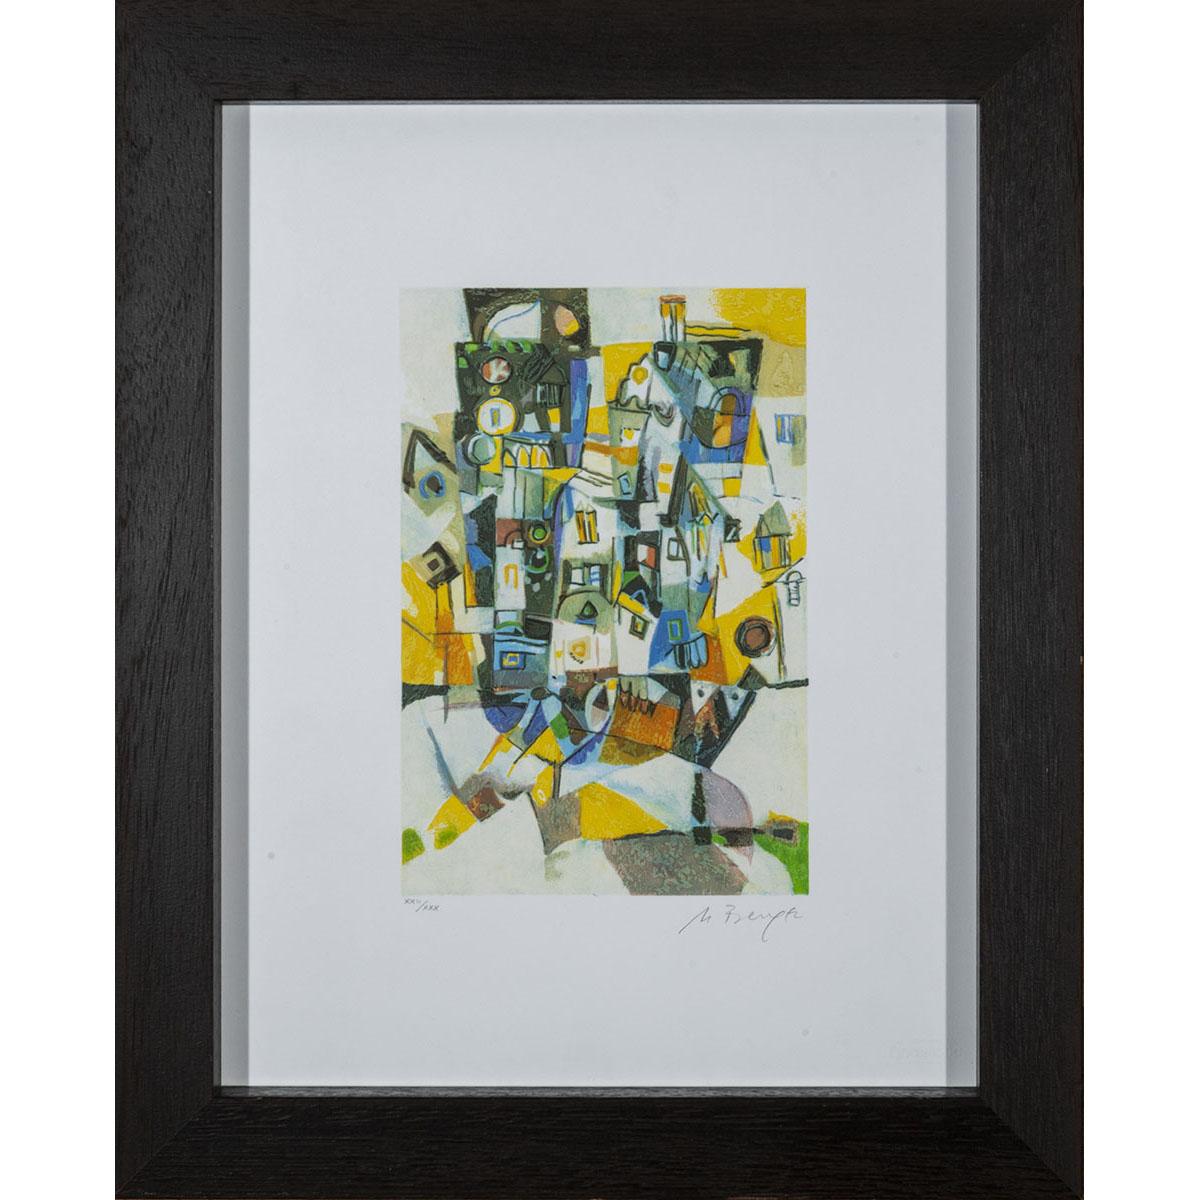 Miljenko Bengez - Senza titolo - Serigrafia 52x42cm